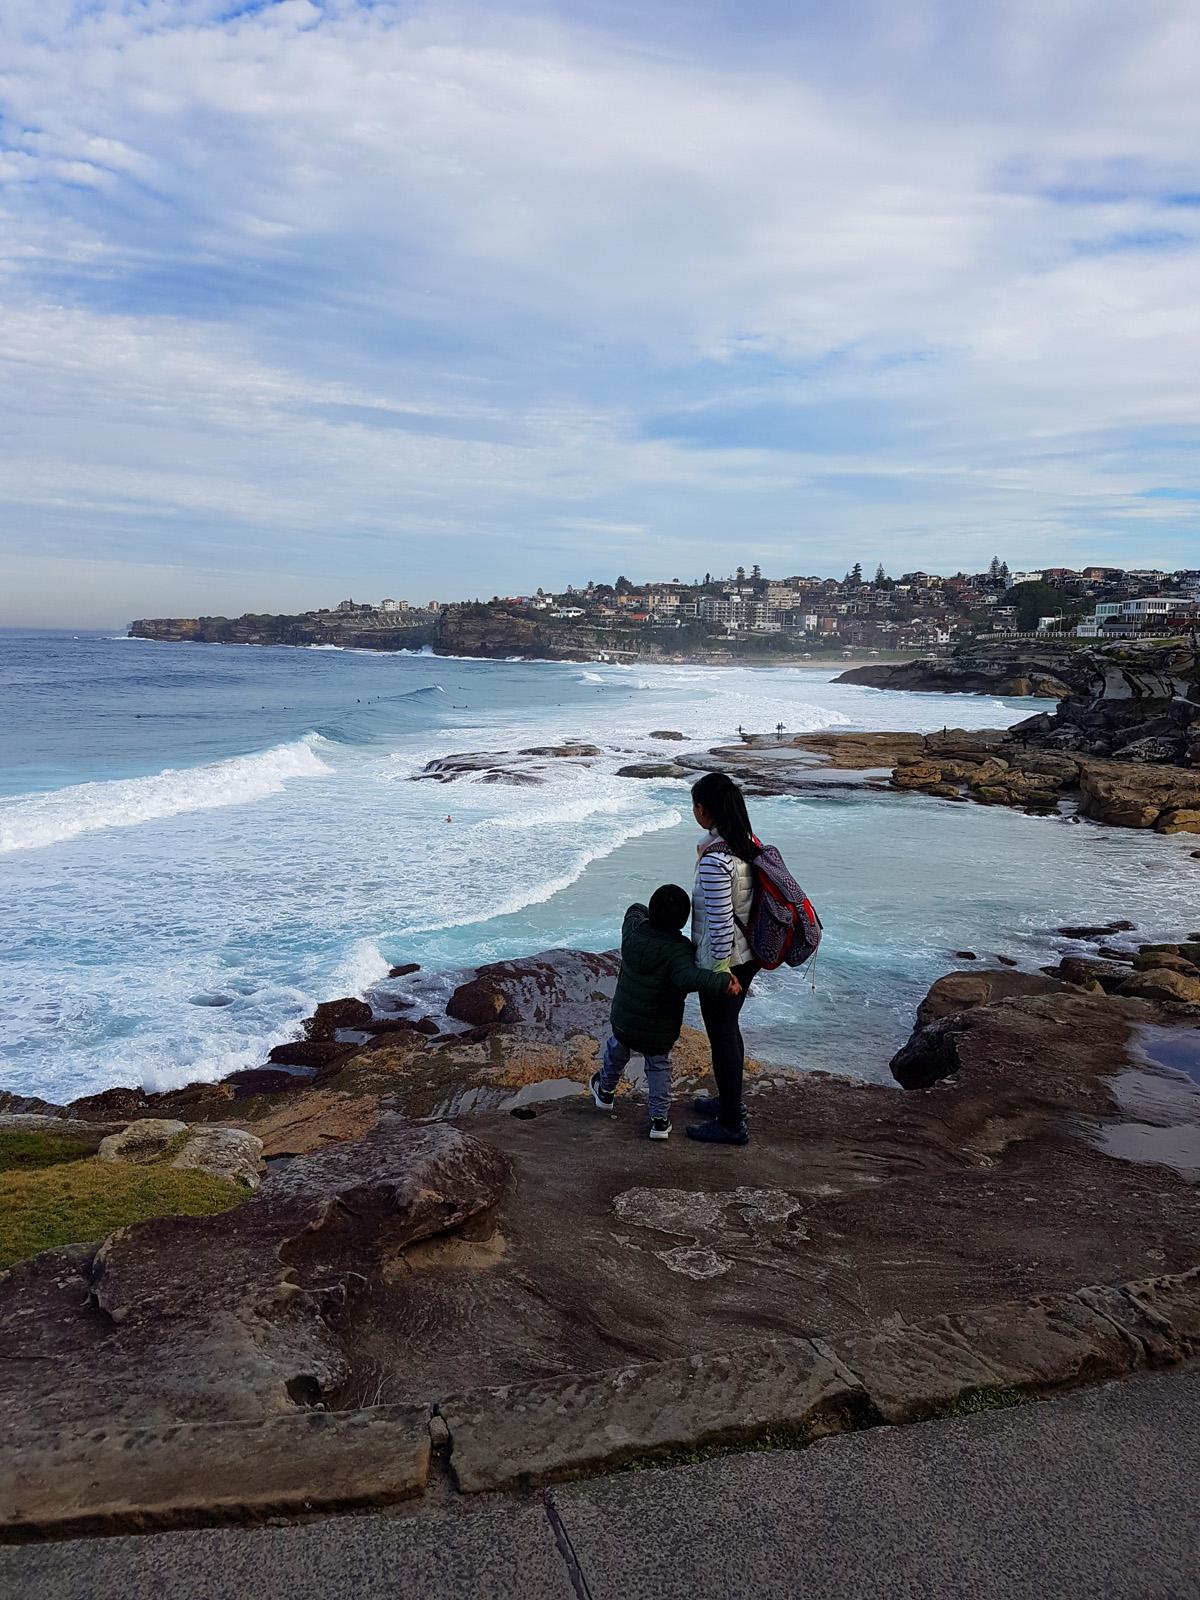 SGMT Australia Sydney_Bondi to Coogee Coastal Walk_28 Cliffs Tamarama Beach Bondi Beach L and A